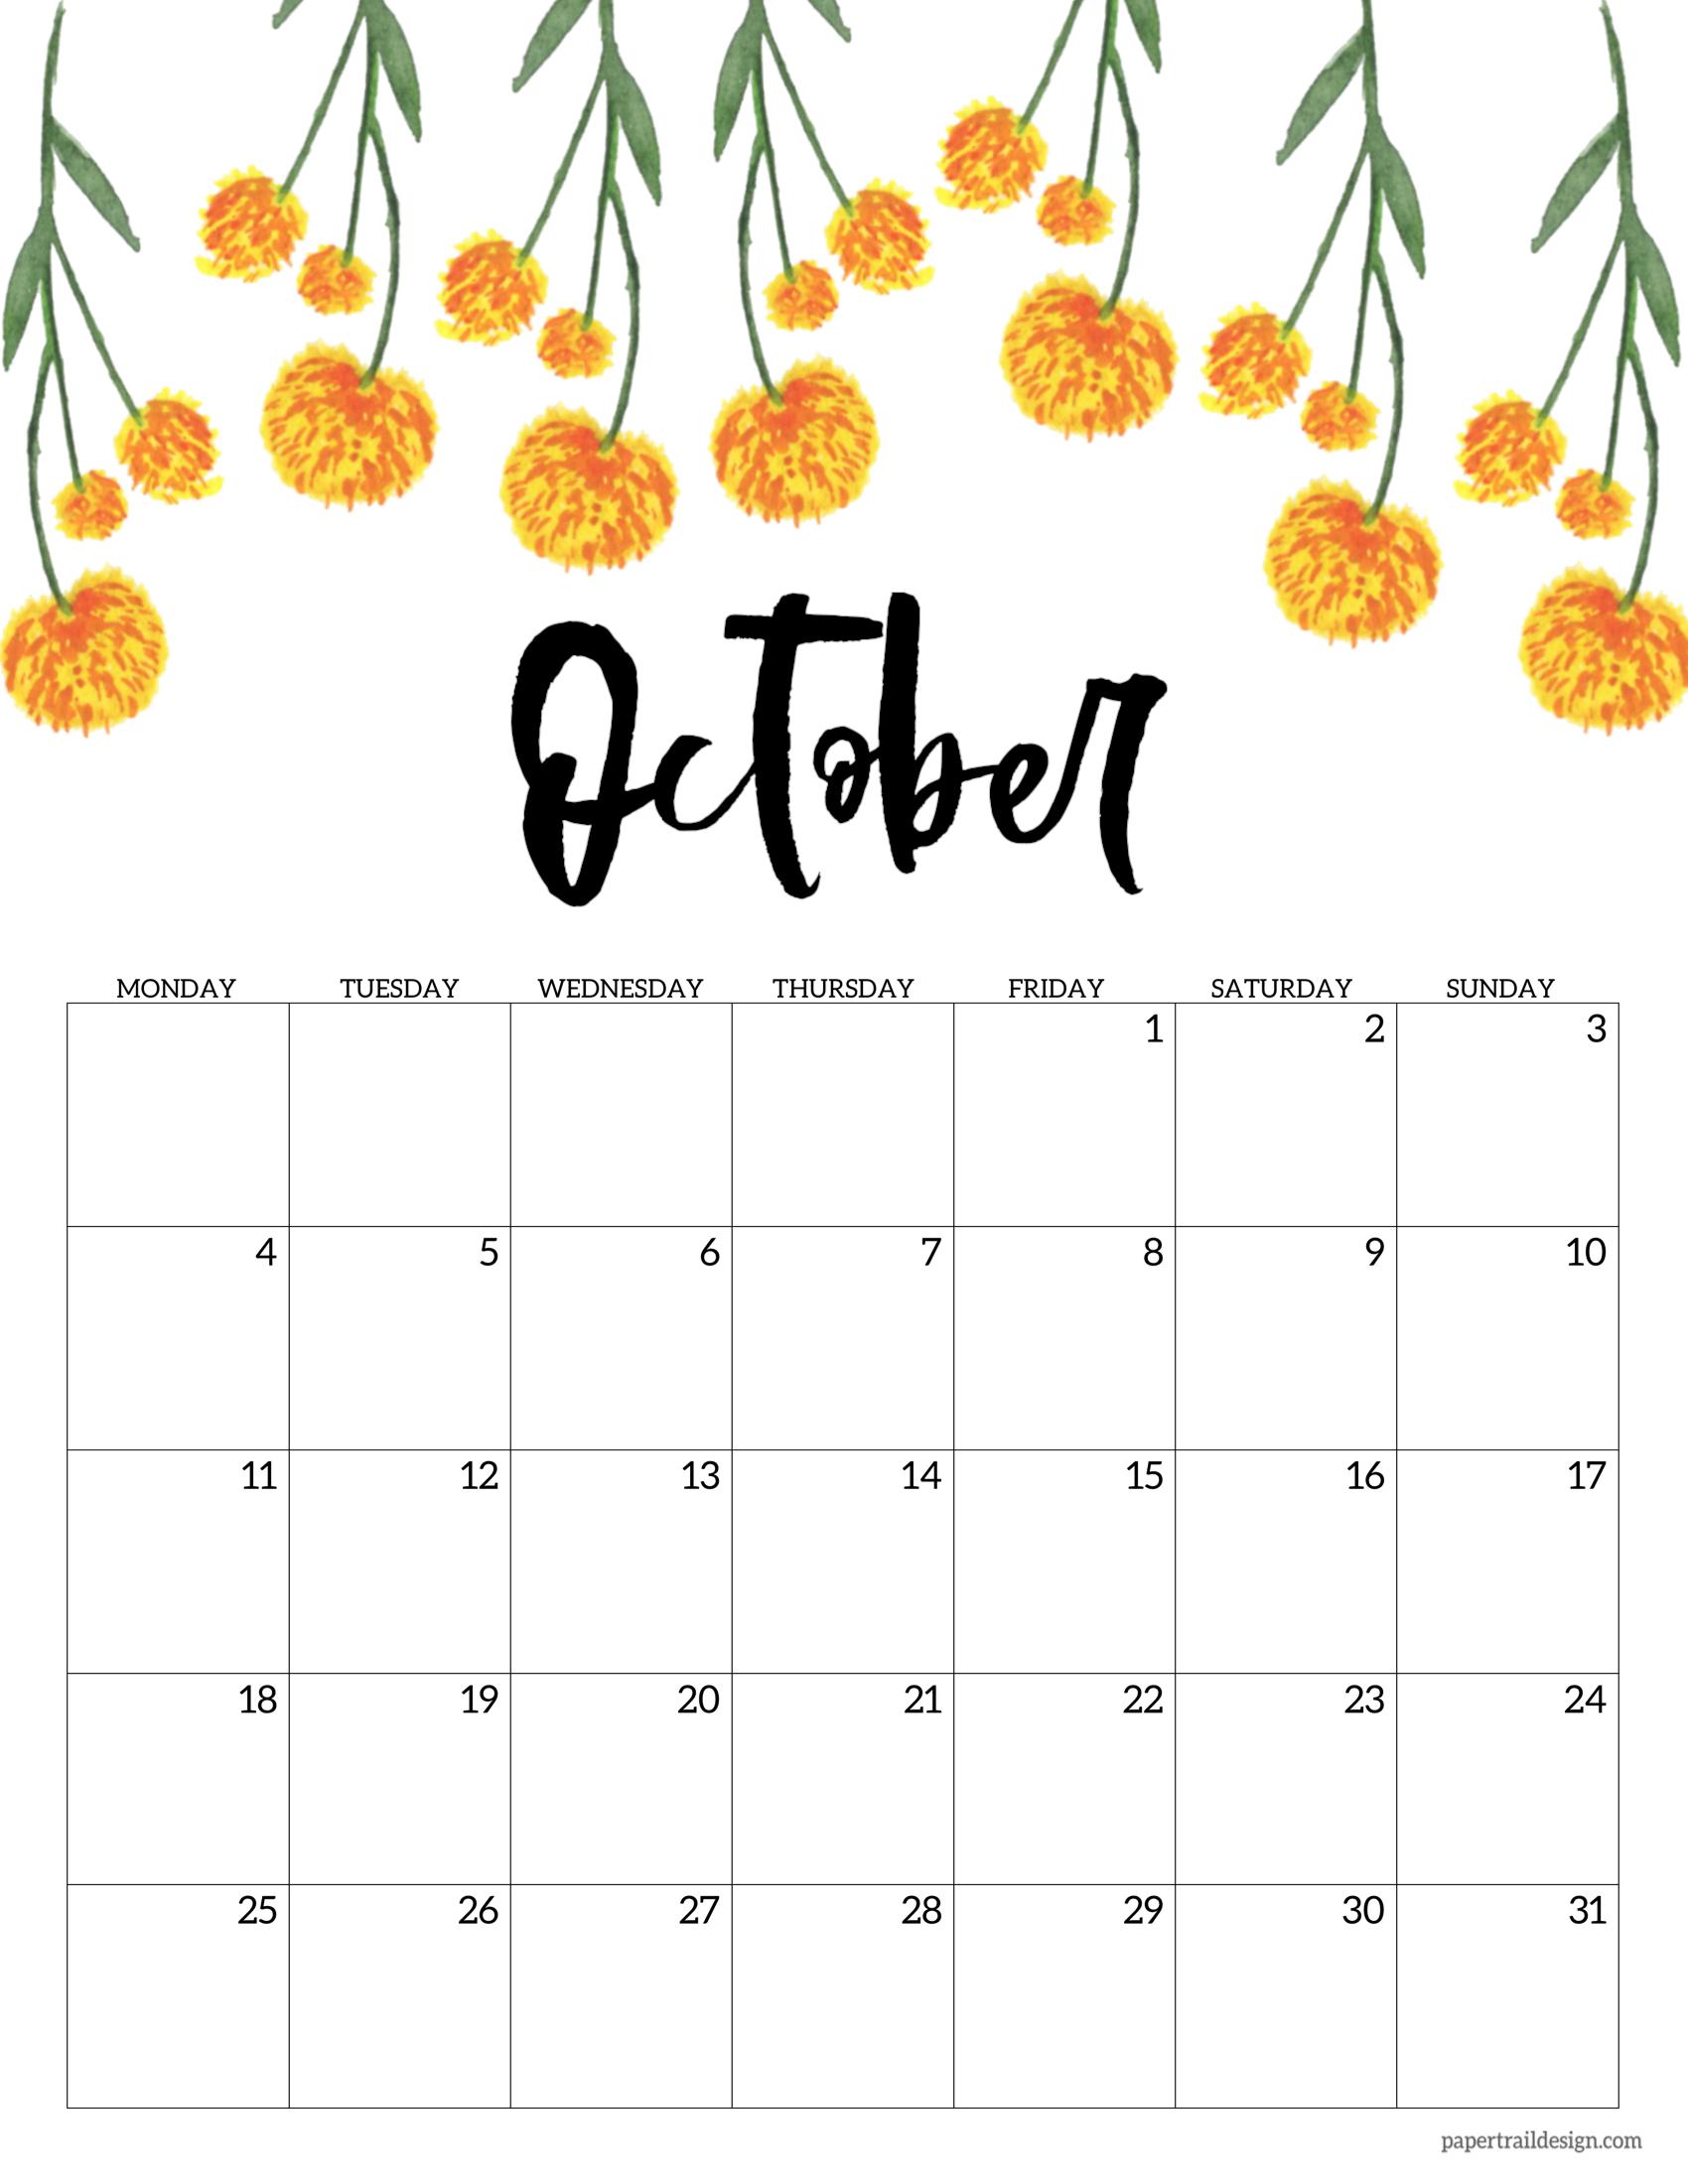 Free Printable 2021 Floral Calendar - Monday Start | Paper